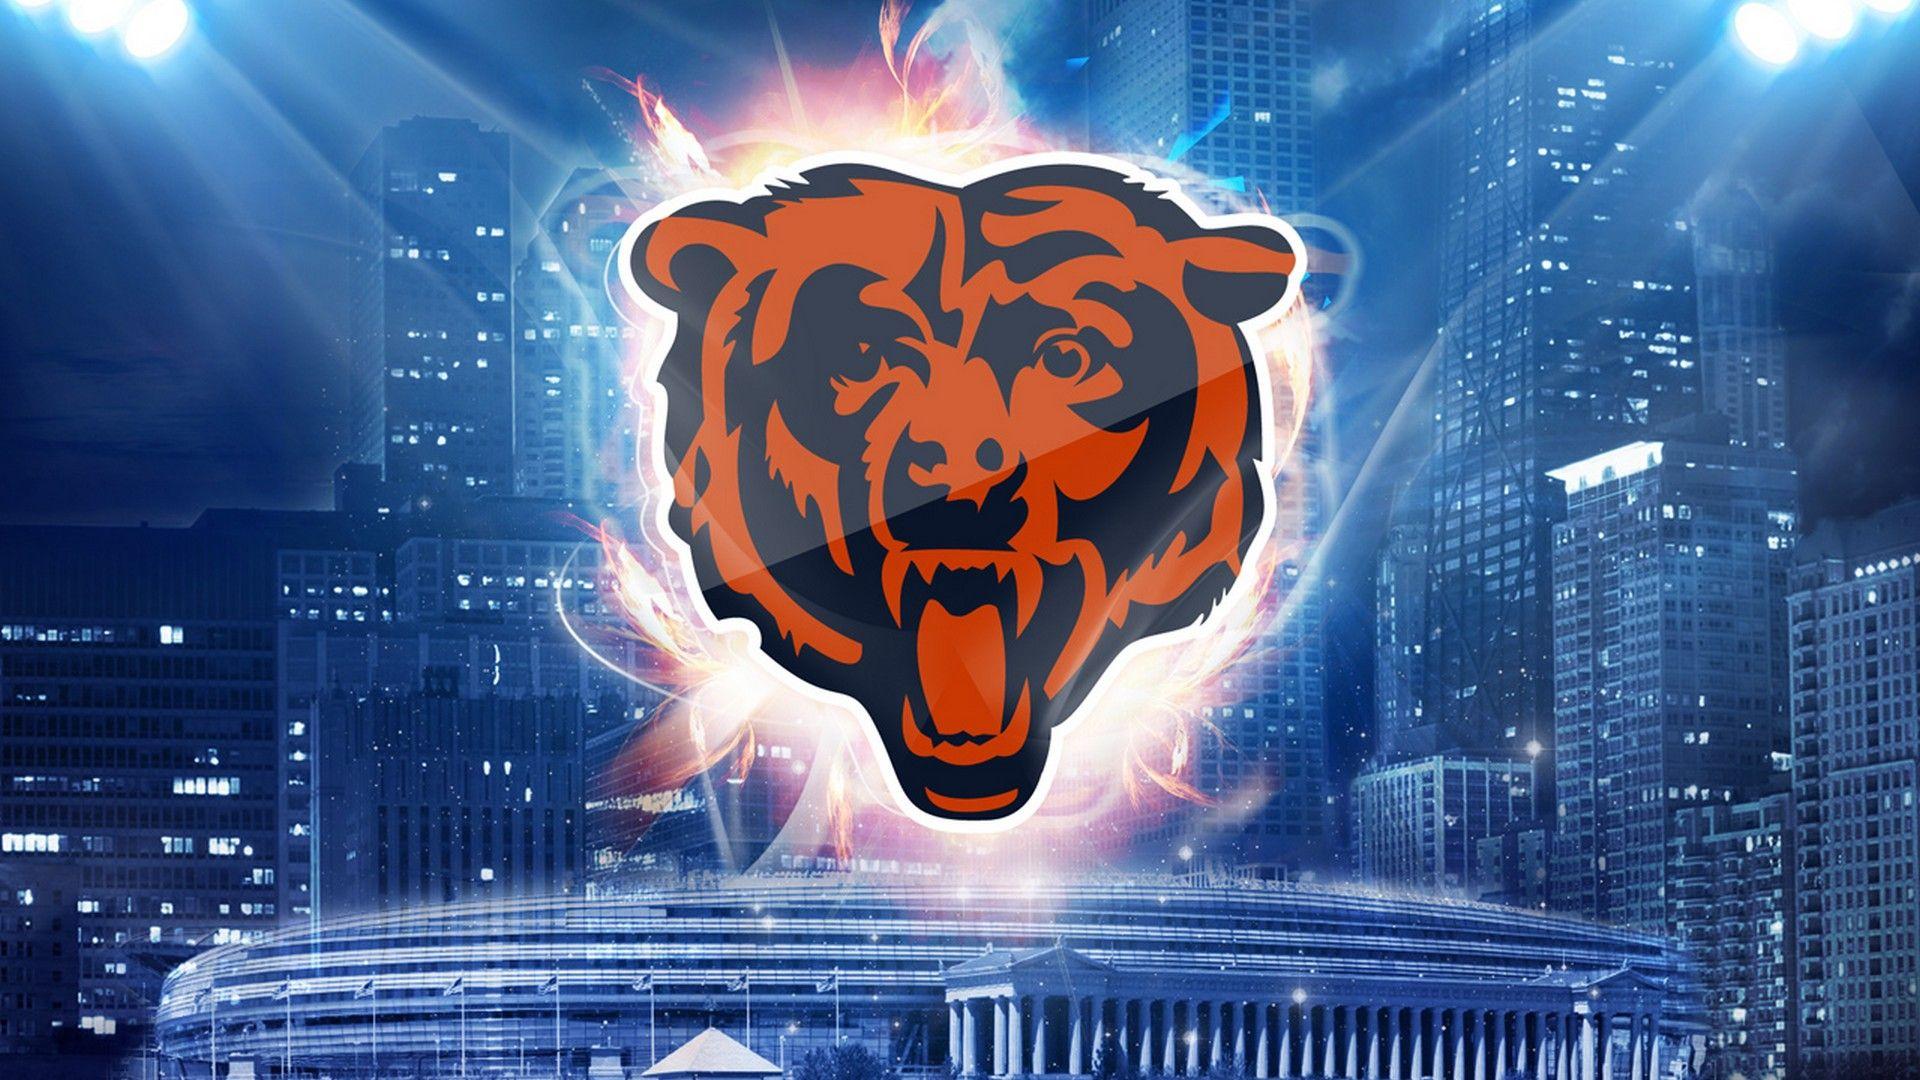 Wallpapers Hd Bears 2021 Nfl Football Wallpapers Chicago Bears Wallpaper Chicago Bears Logo Chicago Bears